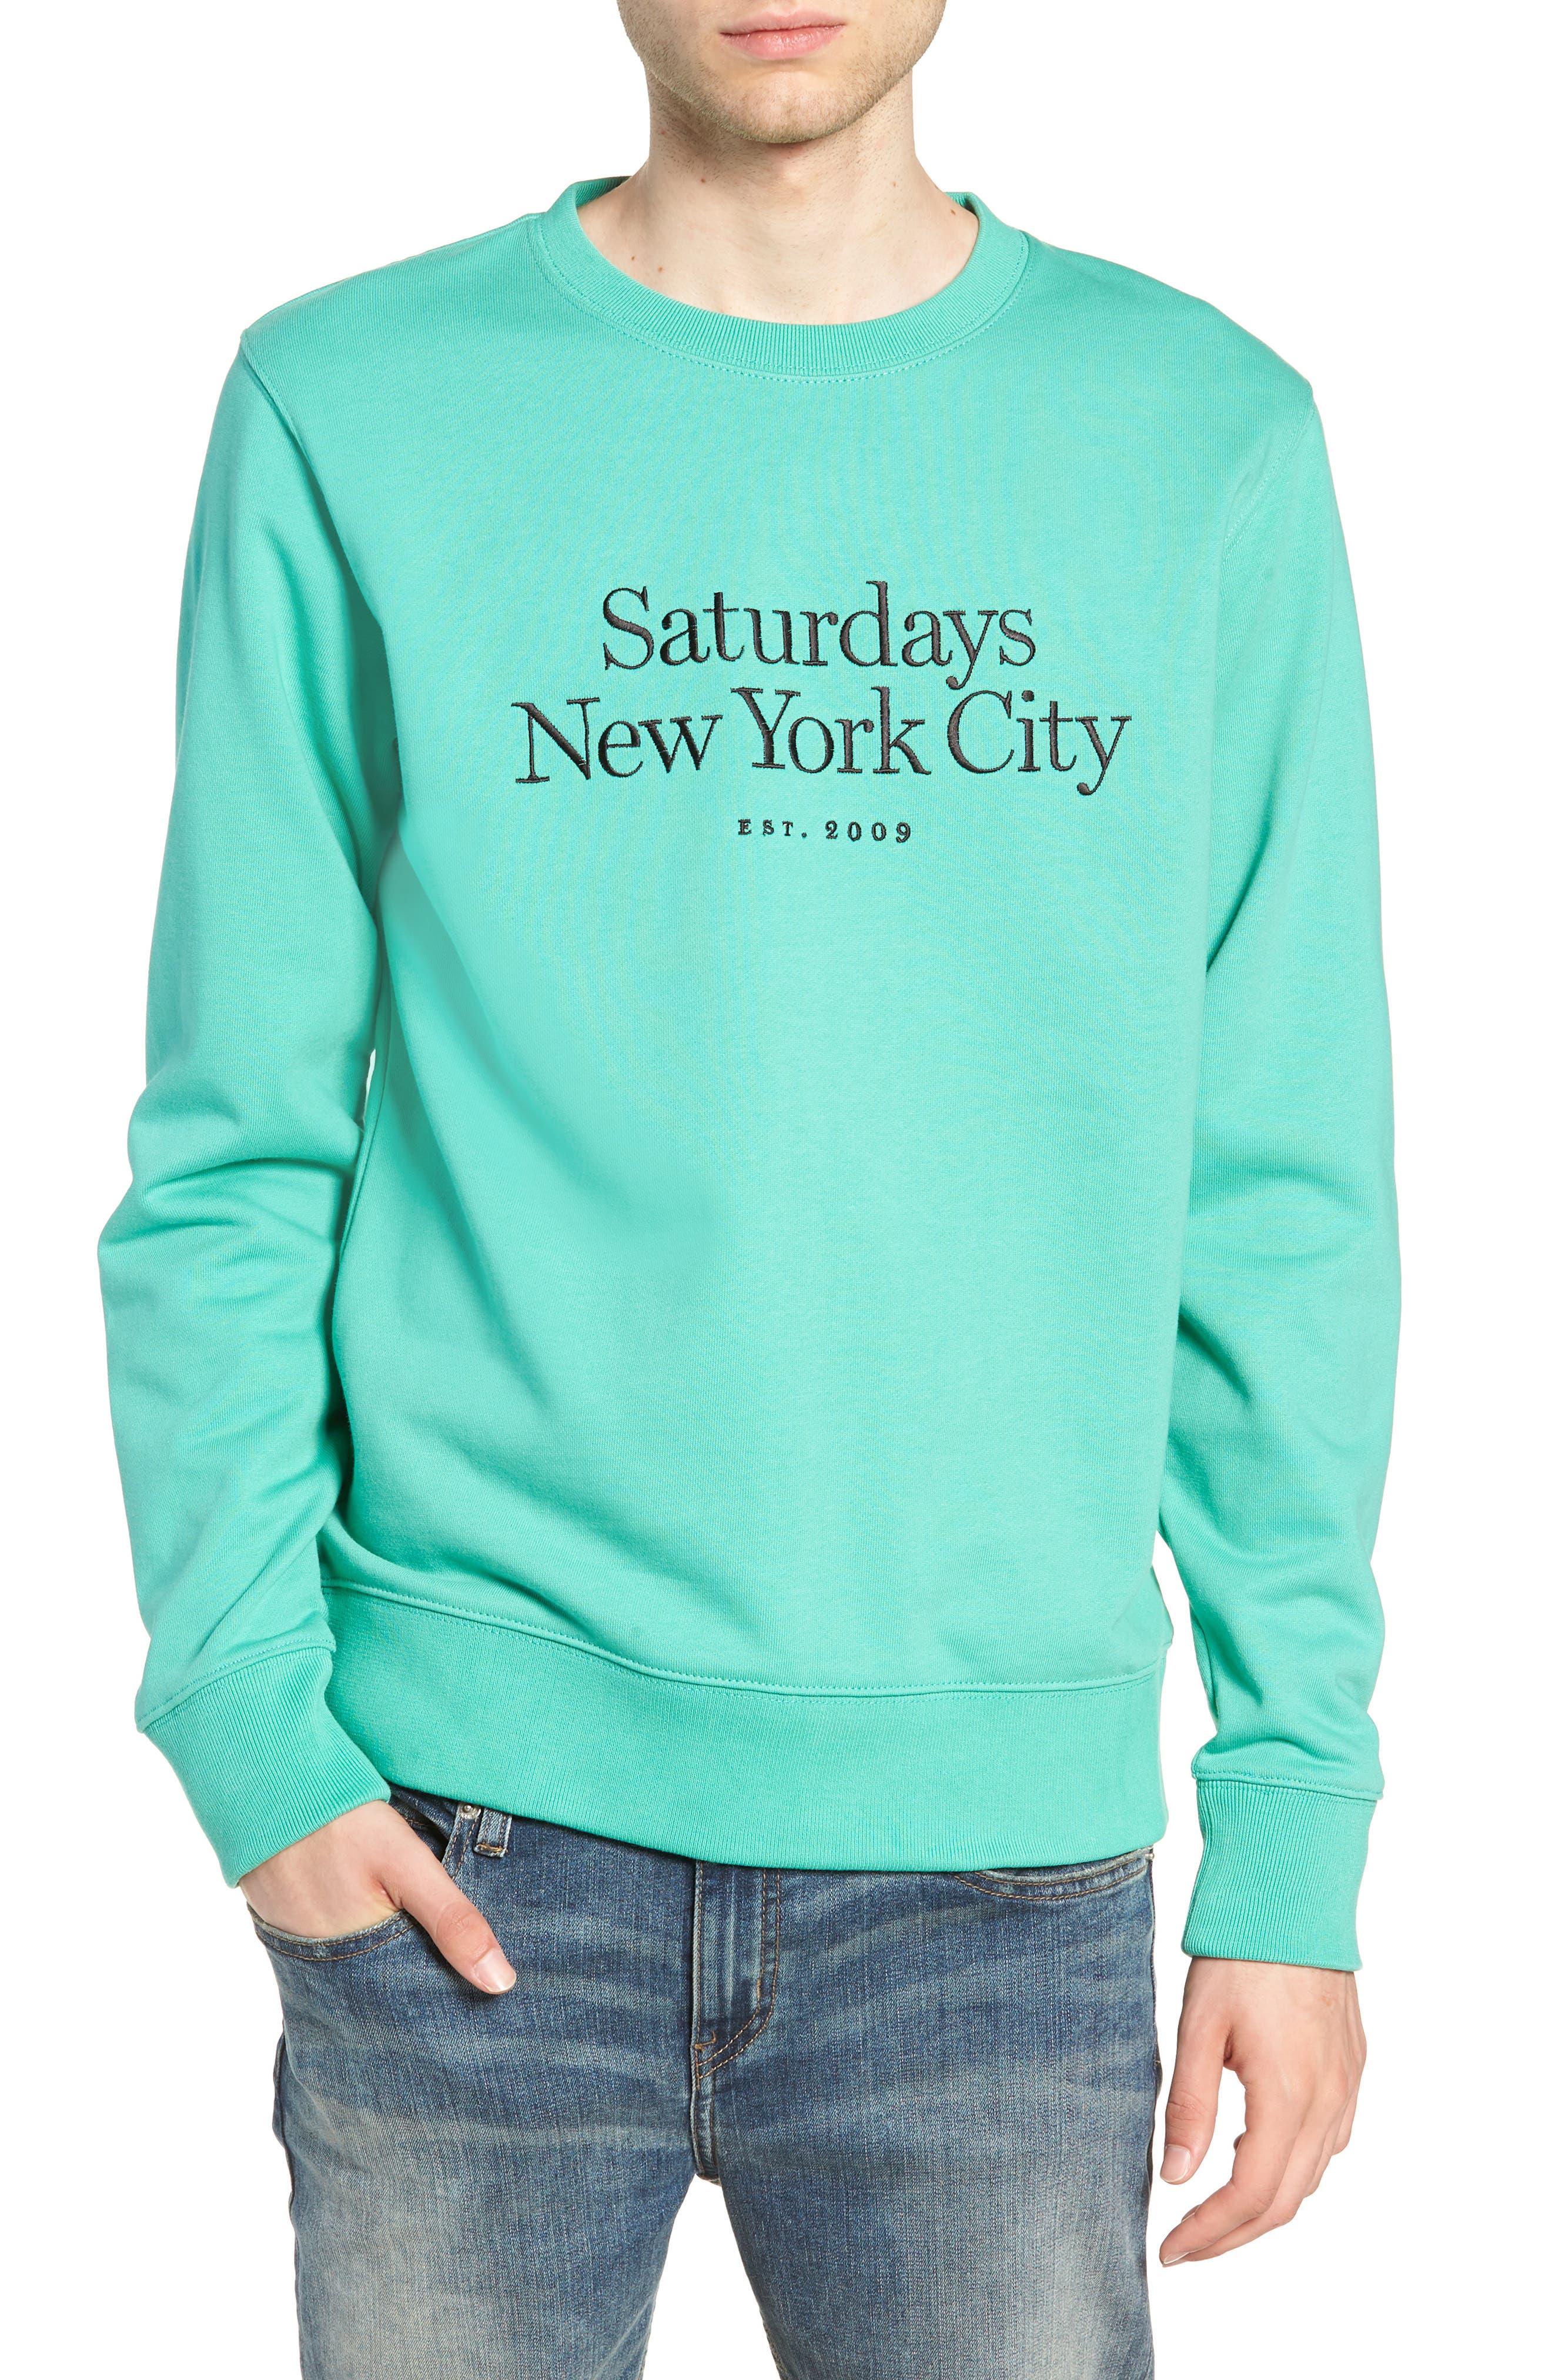 Bowery Embroidered Fleece Sweatshirt,                         Main,                         color, SEAFOAM GREEN